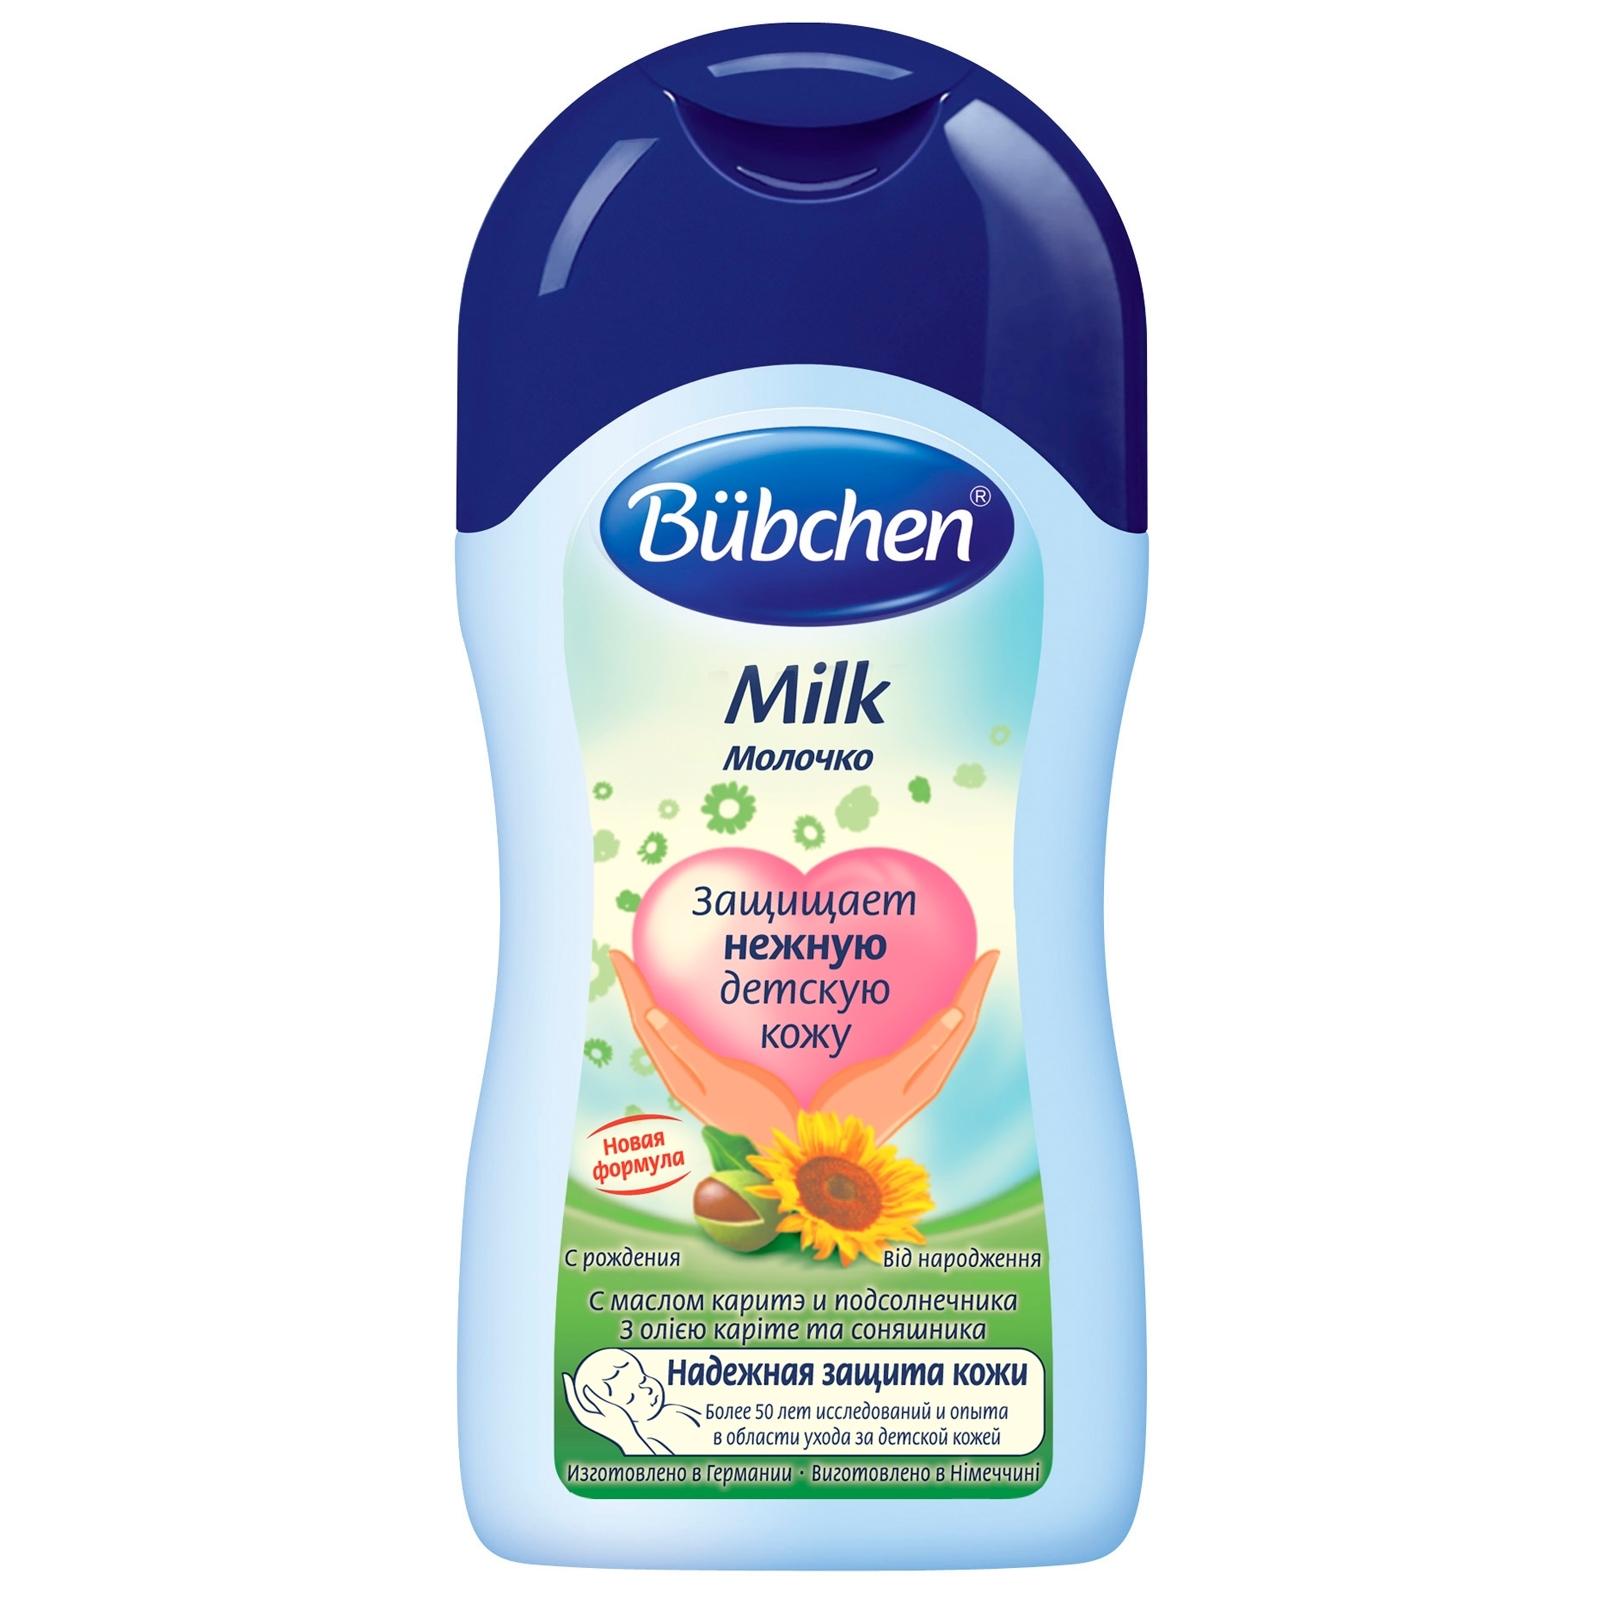 ������� Bubchen ����������� 400 ��  � ������� ������ � �������������